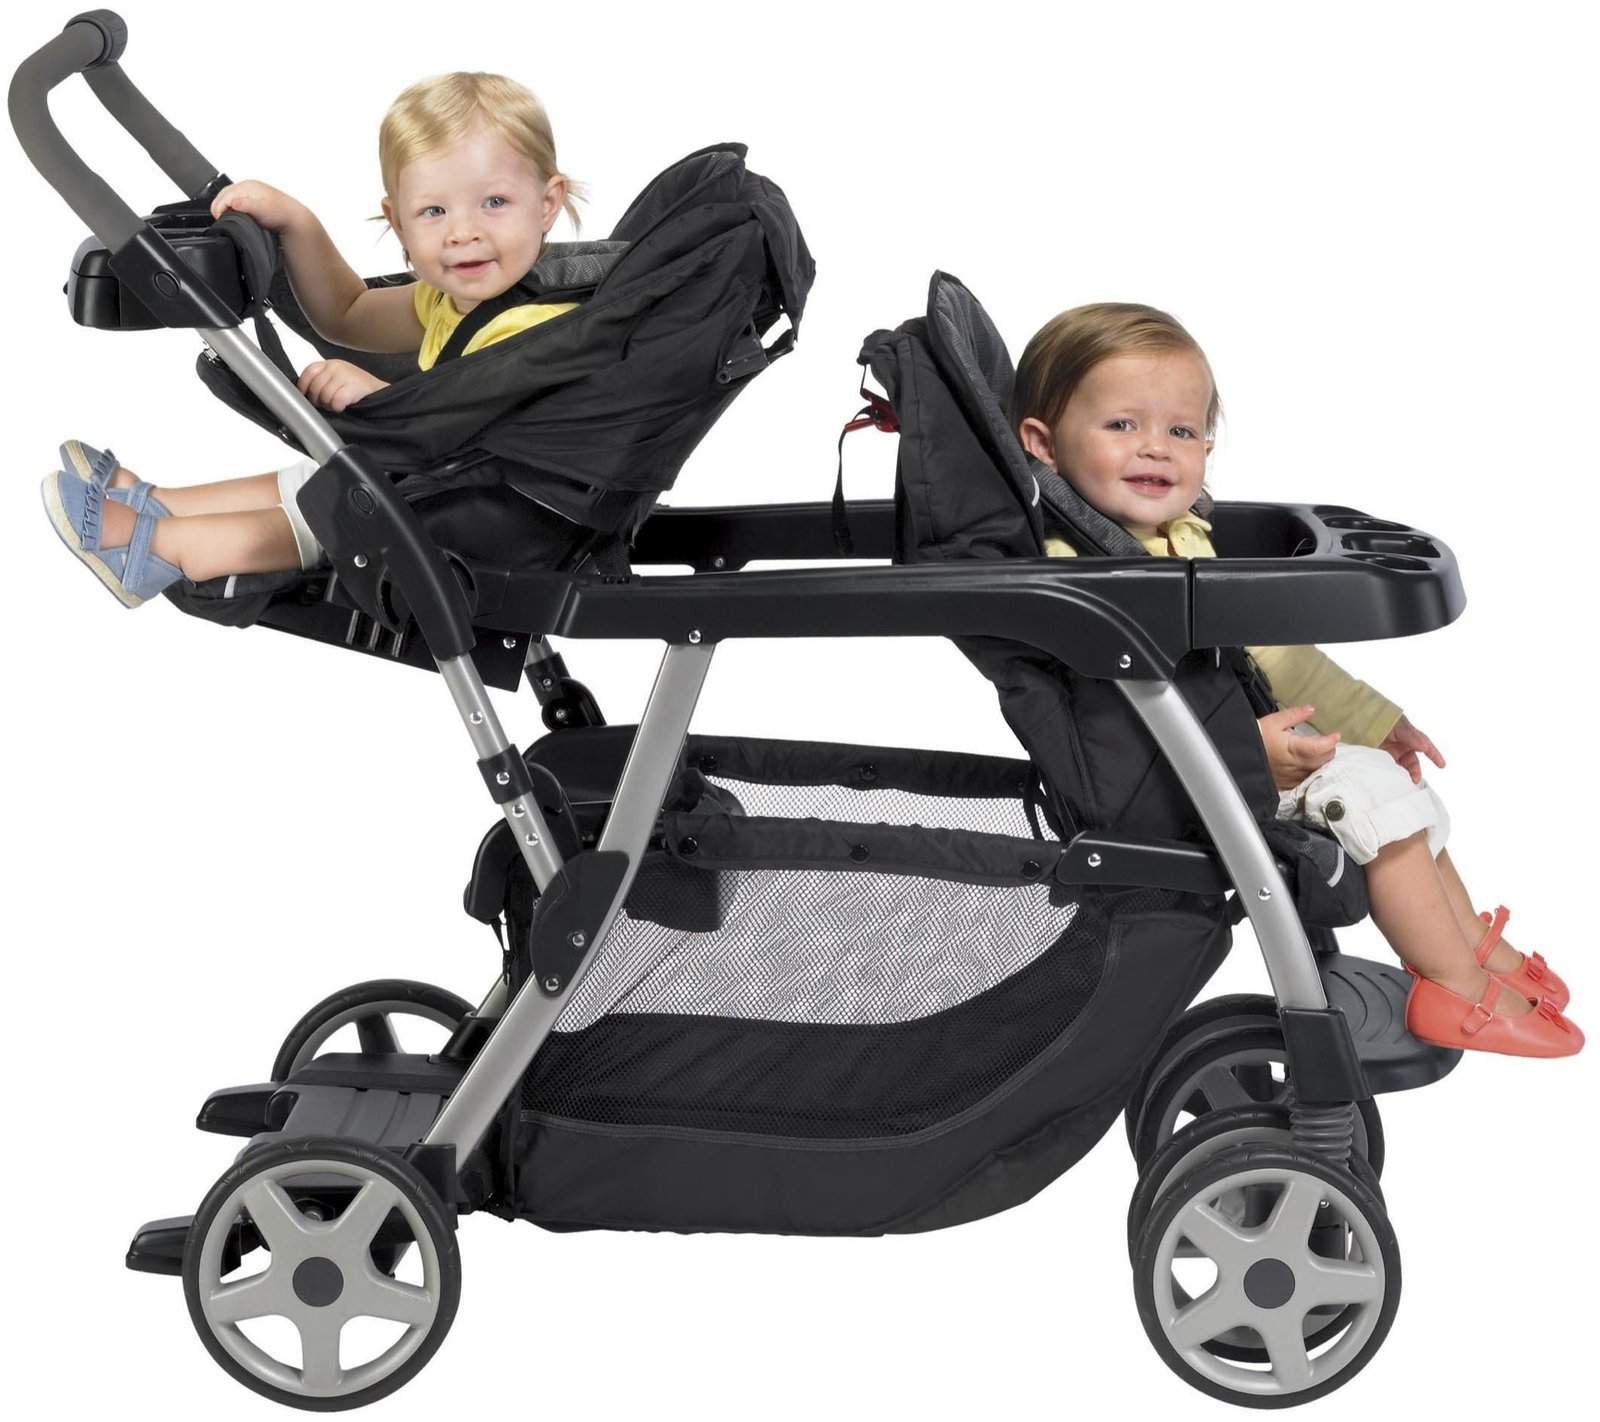 двойняшки в коляске для двойни